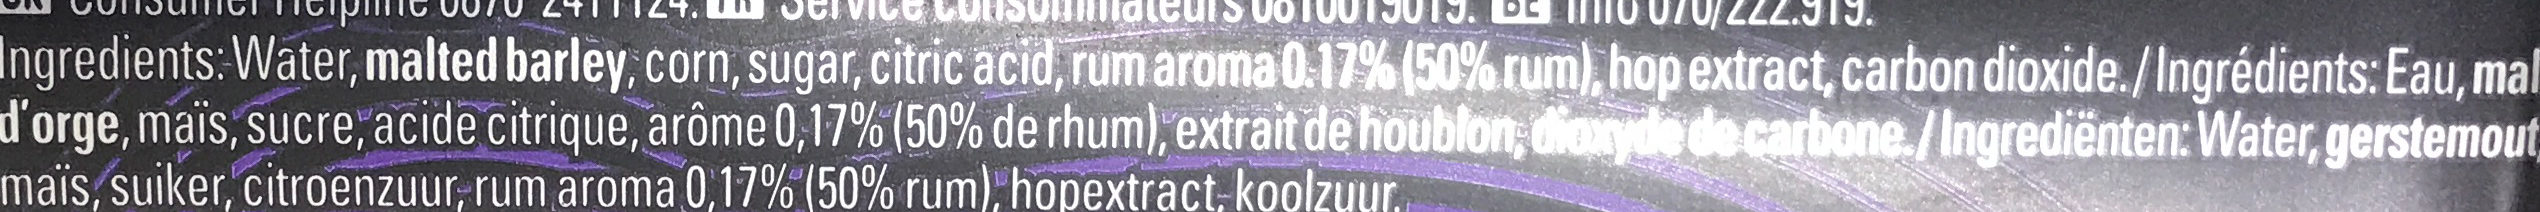 Bière Aromatisé au Rhum - Ingrediënten - fr